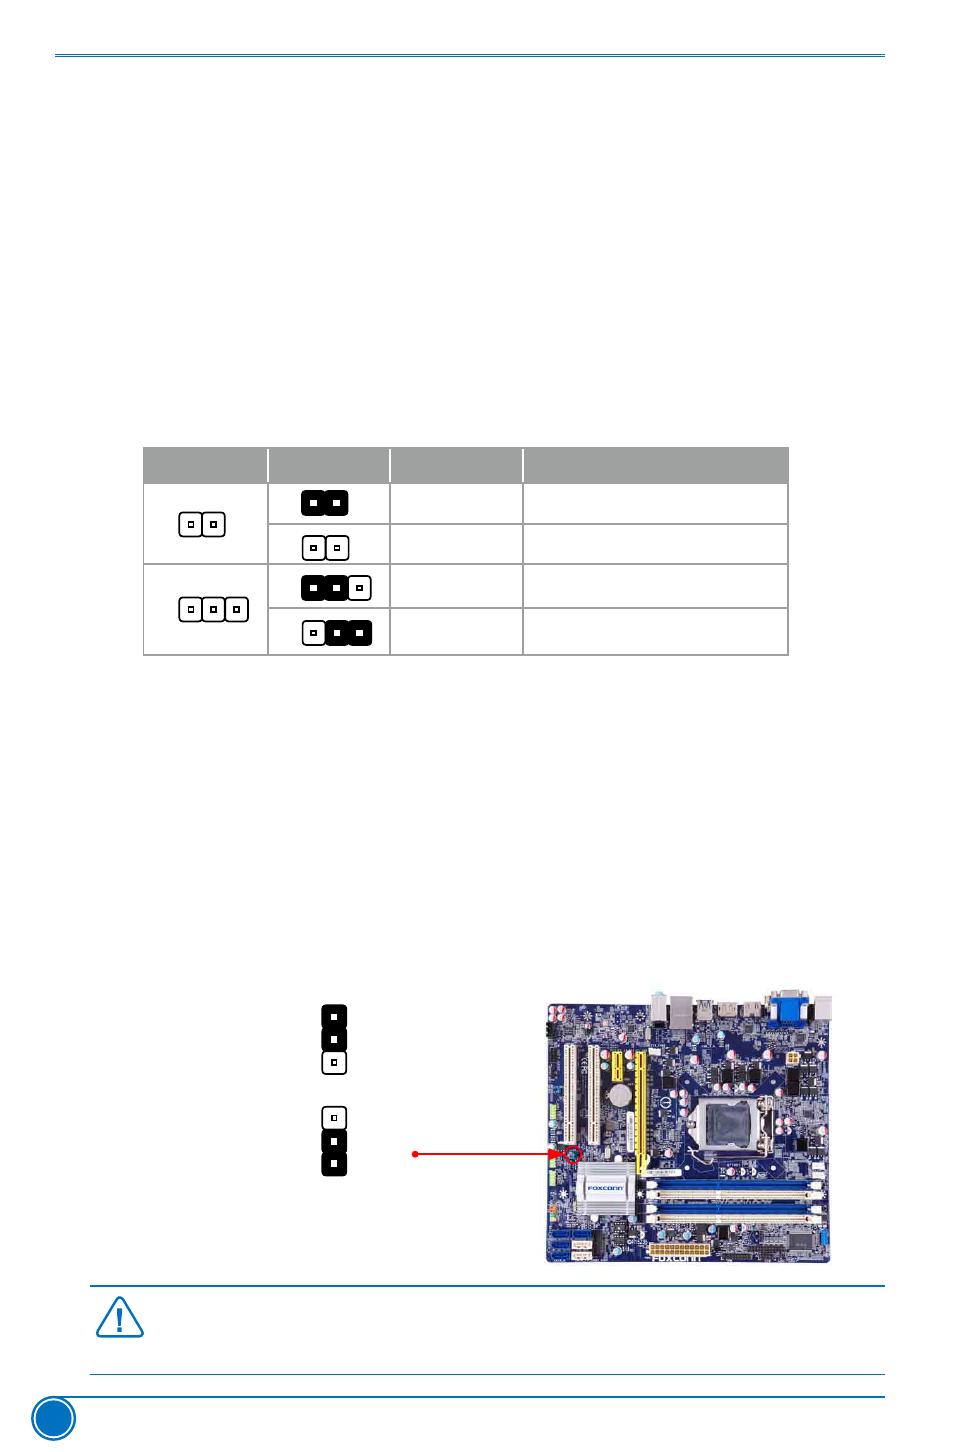 5 jumpers, Clear cmos jumper: clr_cmos | Foxconn B75M User Manual